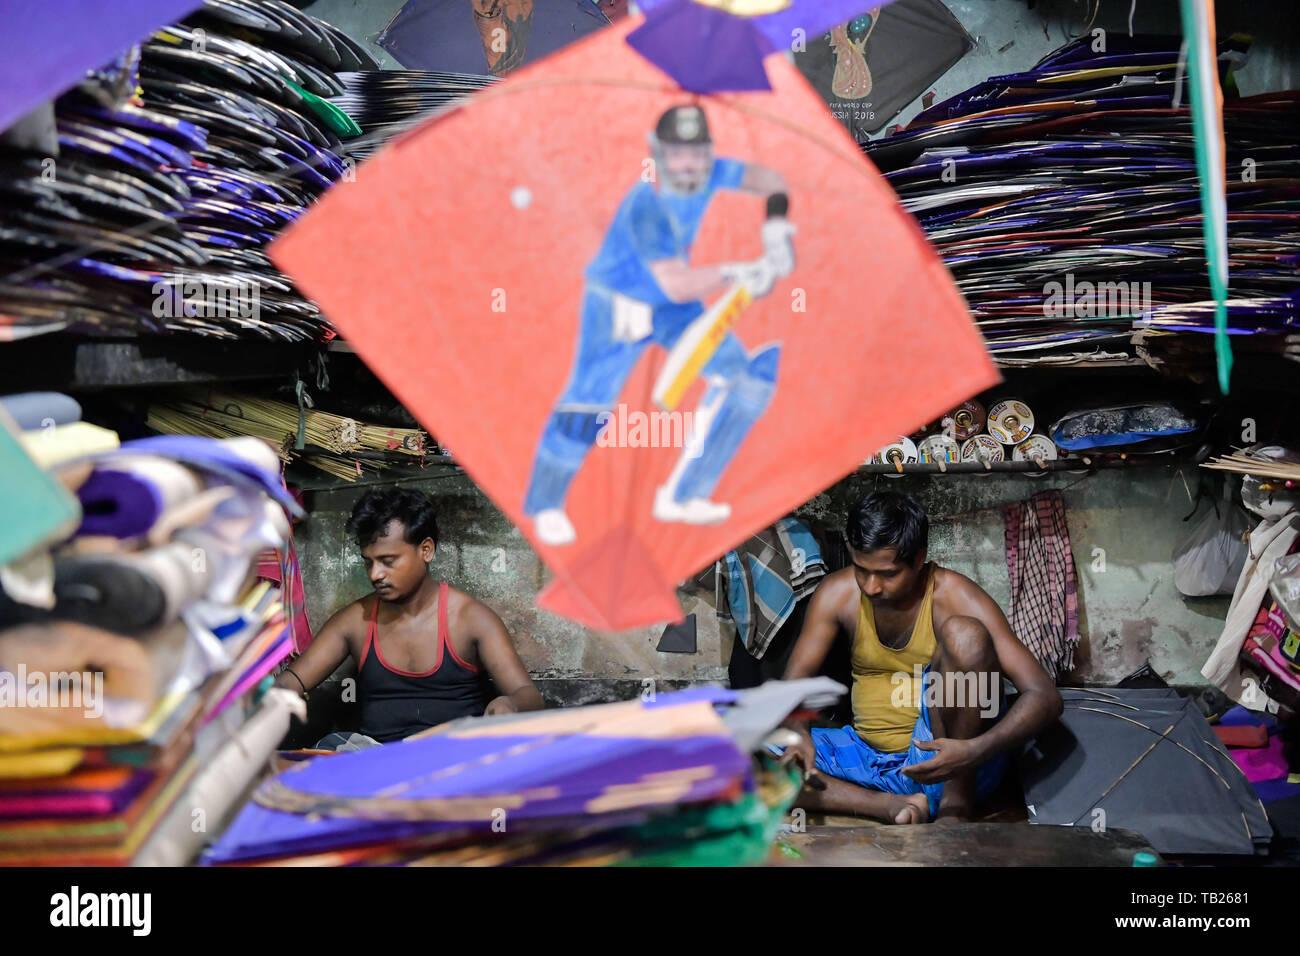 Virat Kohli Stock Photos & Virat Kohli Stock Images - Alamy